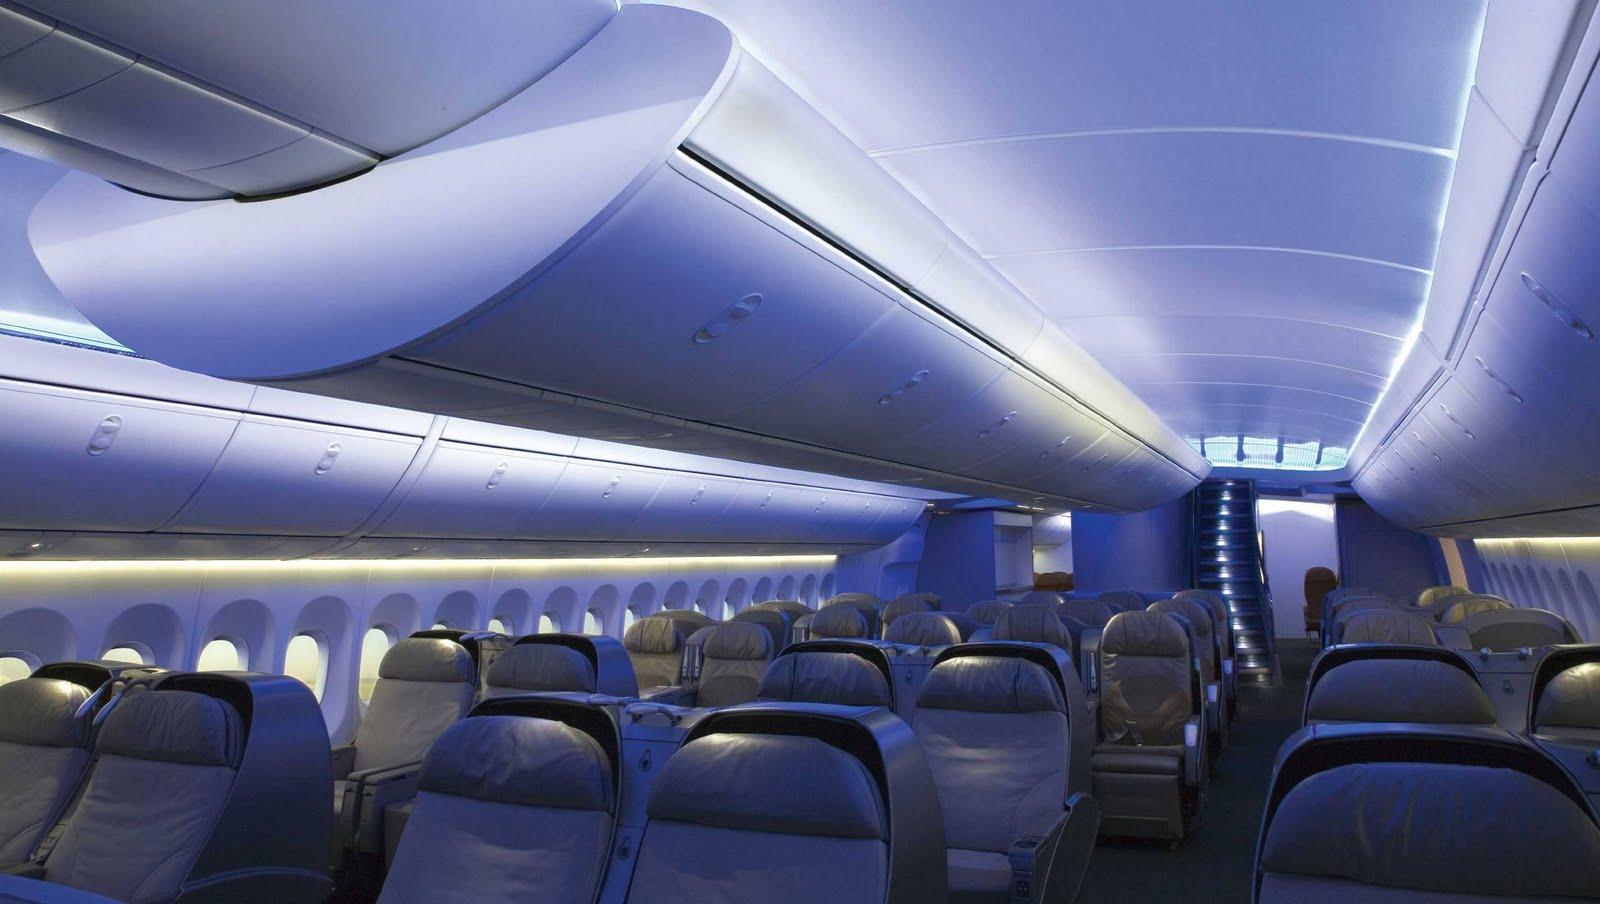 http://2.bp.blogspot.com/-RKnyNPbXQos/ThZEbzjs9HI/AAAAAAAAF2Q/31YQ-o4l8VQ/s1600/b747_8_business_class_cabin_view_42872_aircraft-wallpaper.jpg